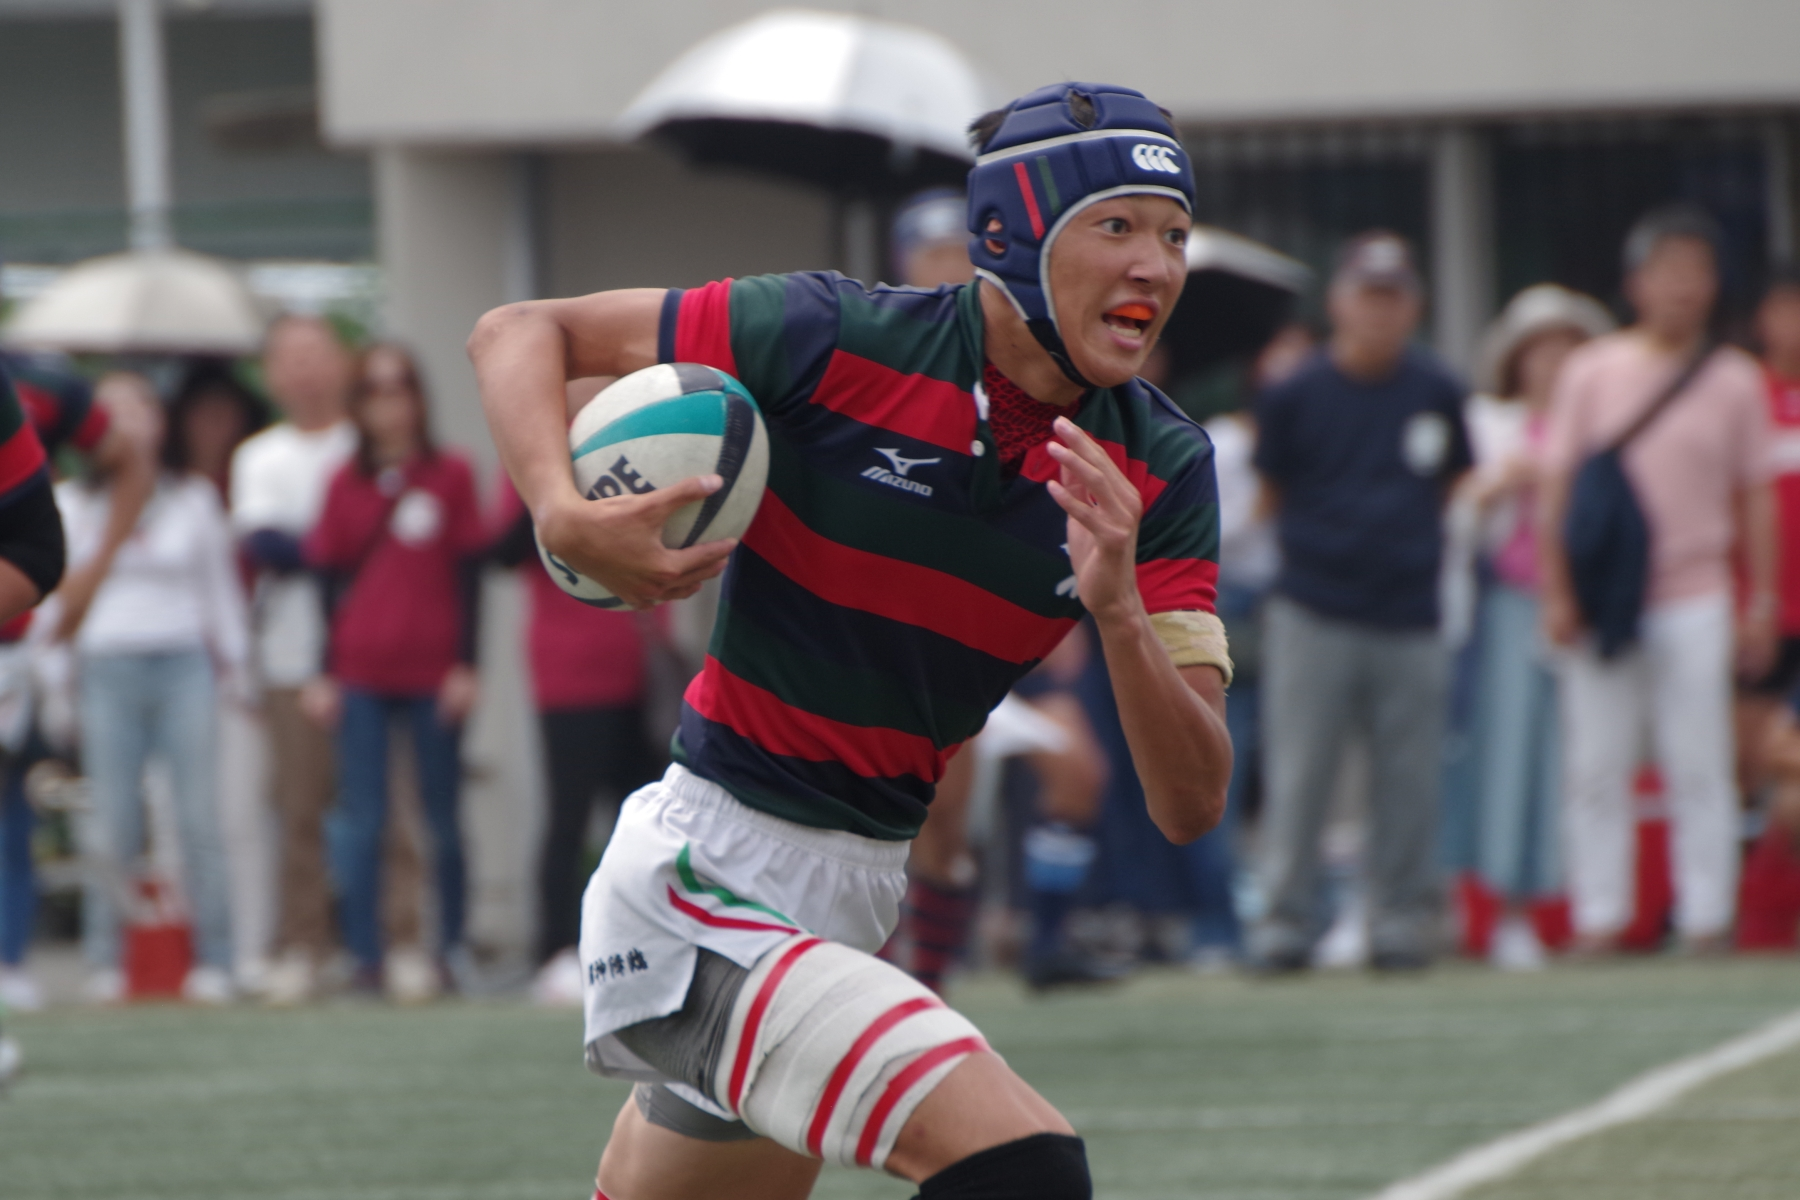 http://kokura-rugby.sakura.ne.jp/180610_103314_0165.jpg